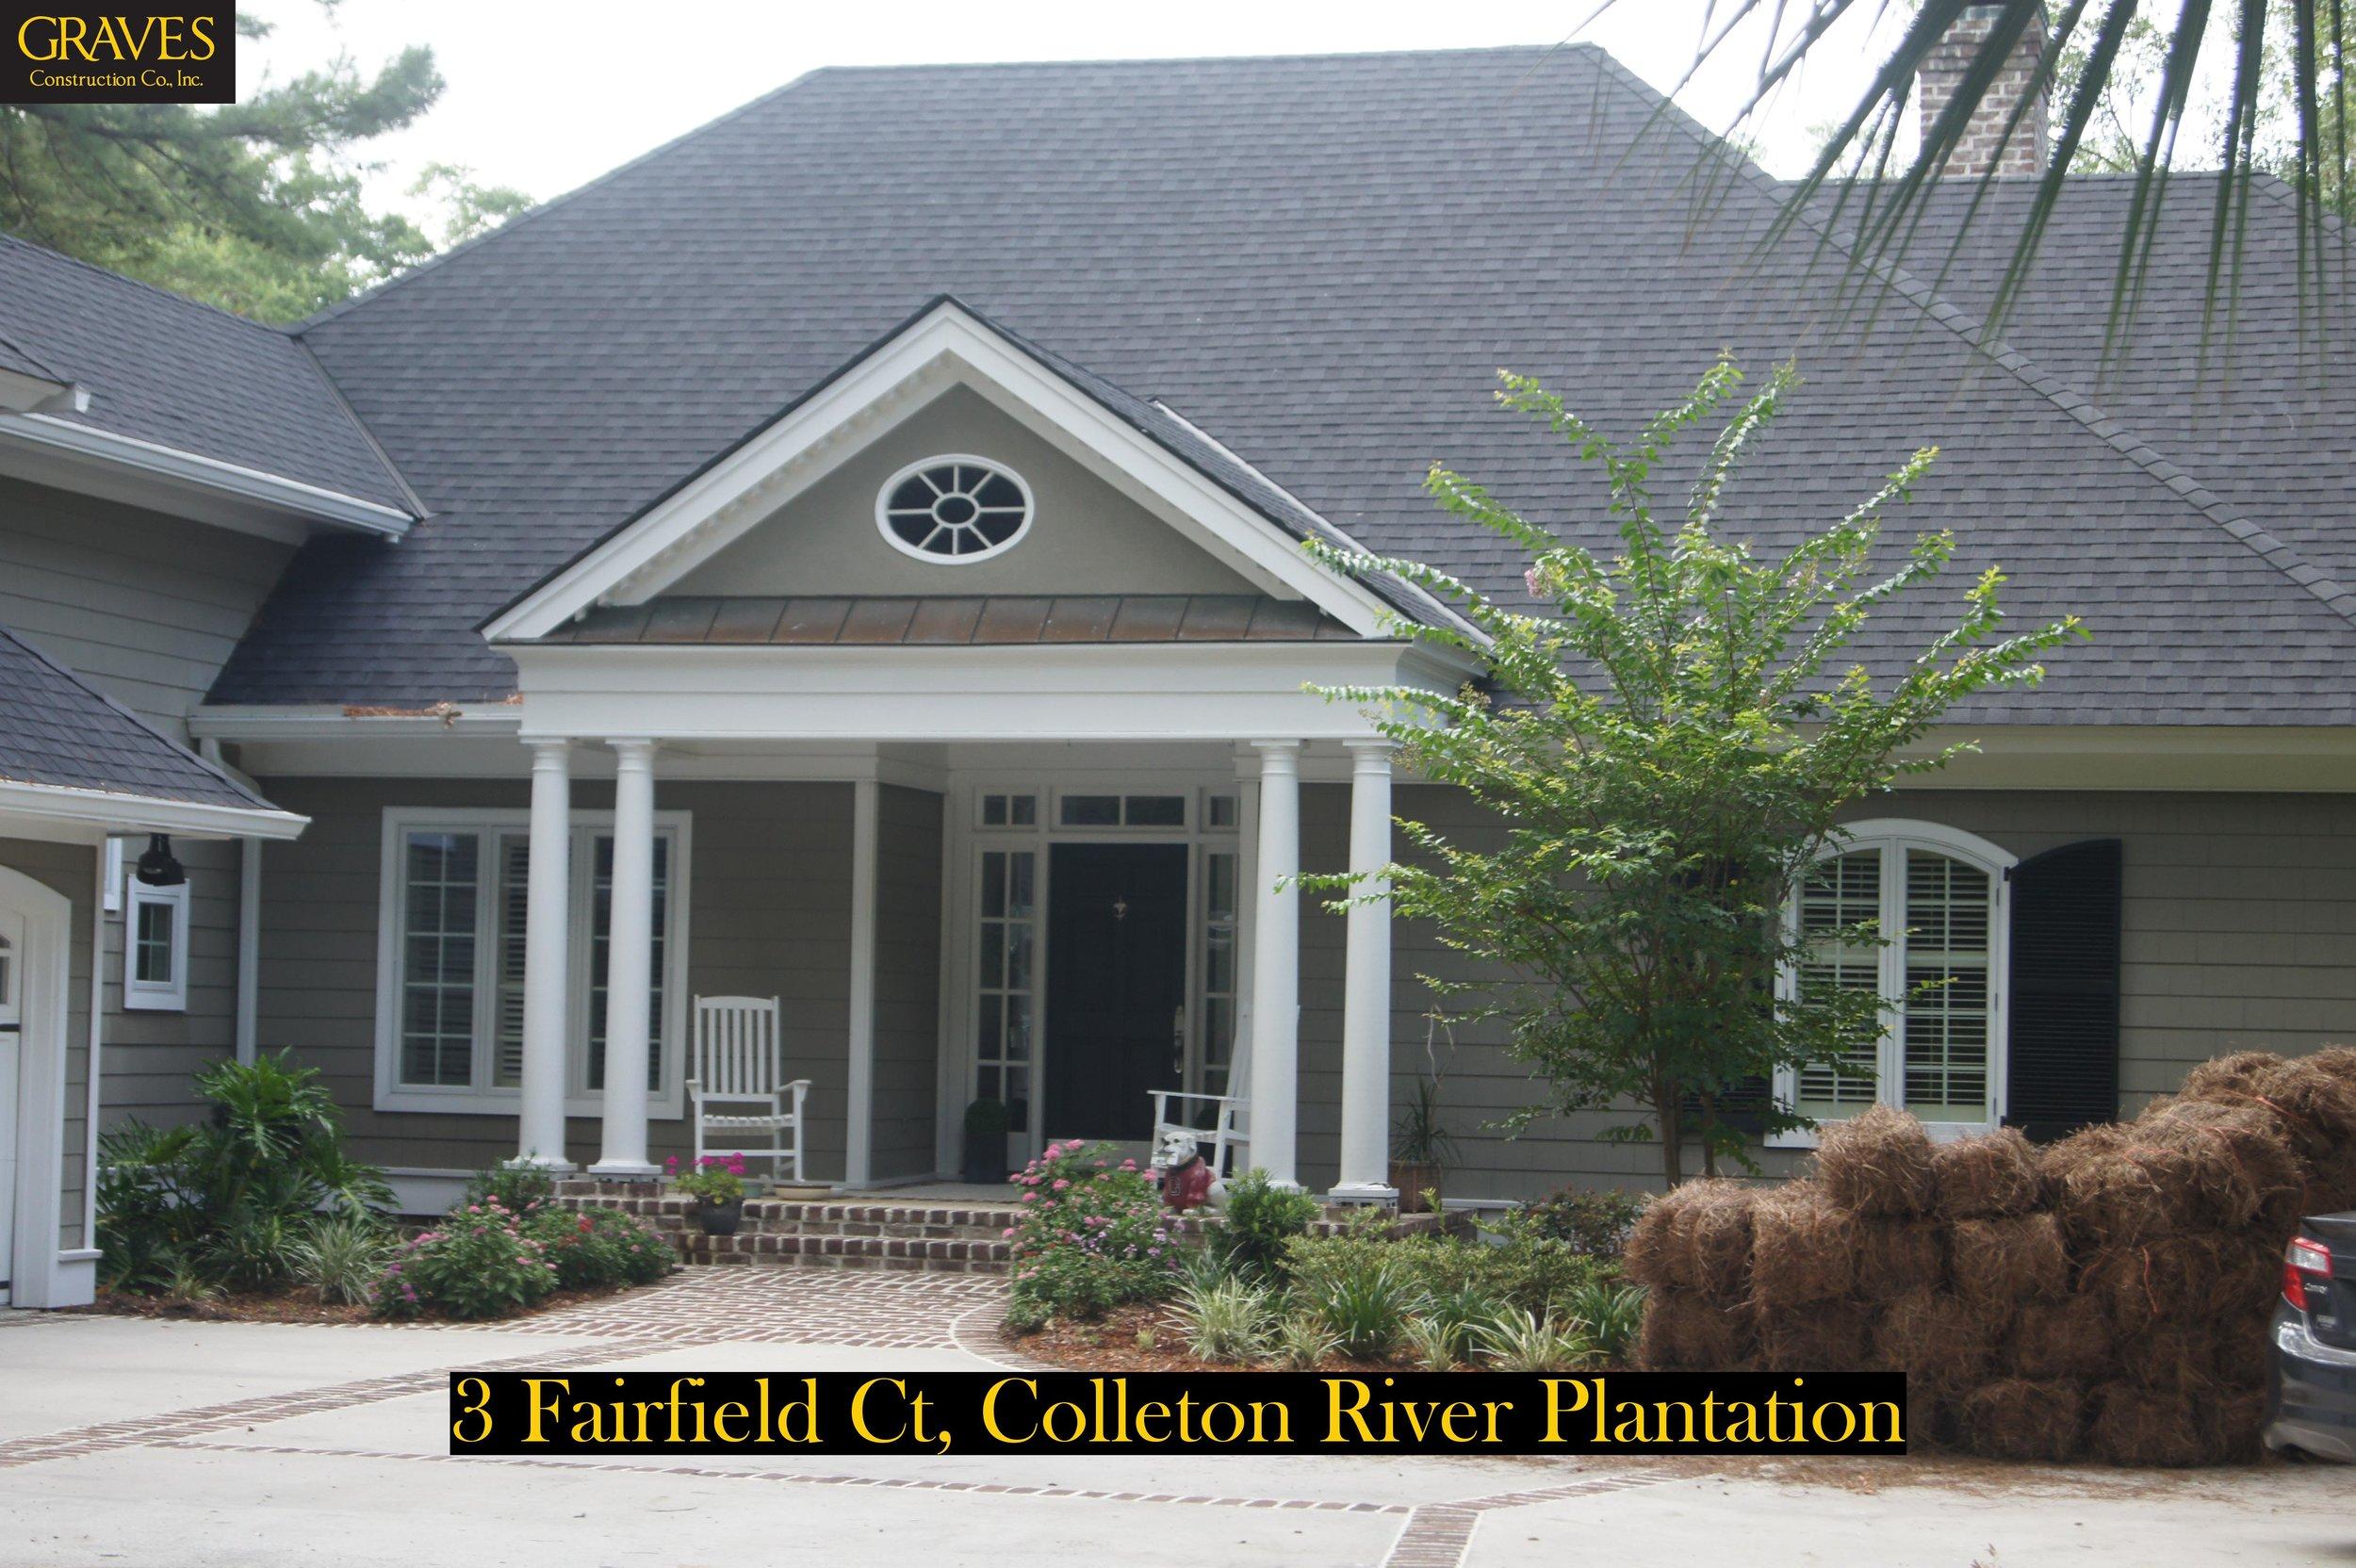 3 Farifield Ct - 2